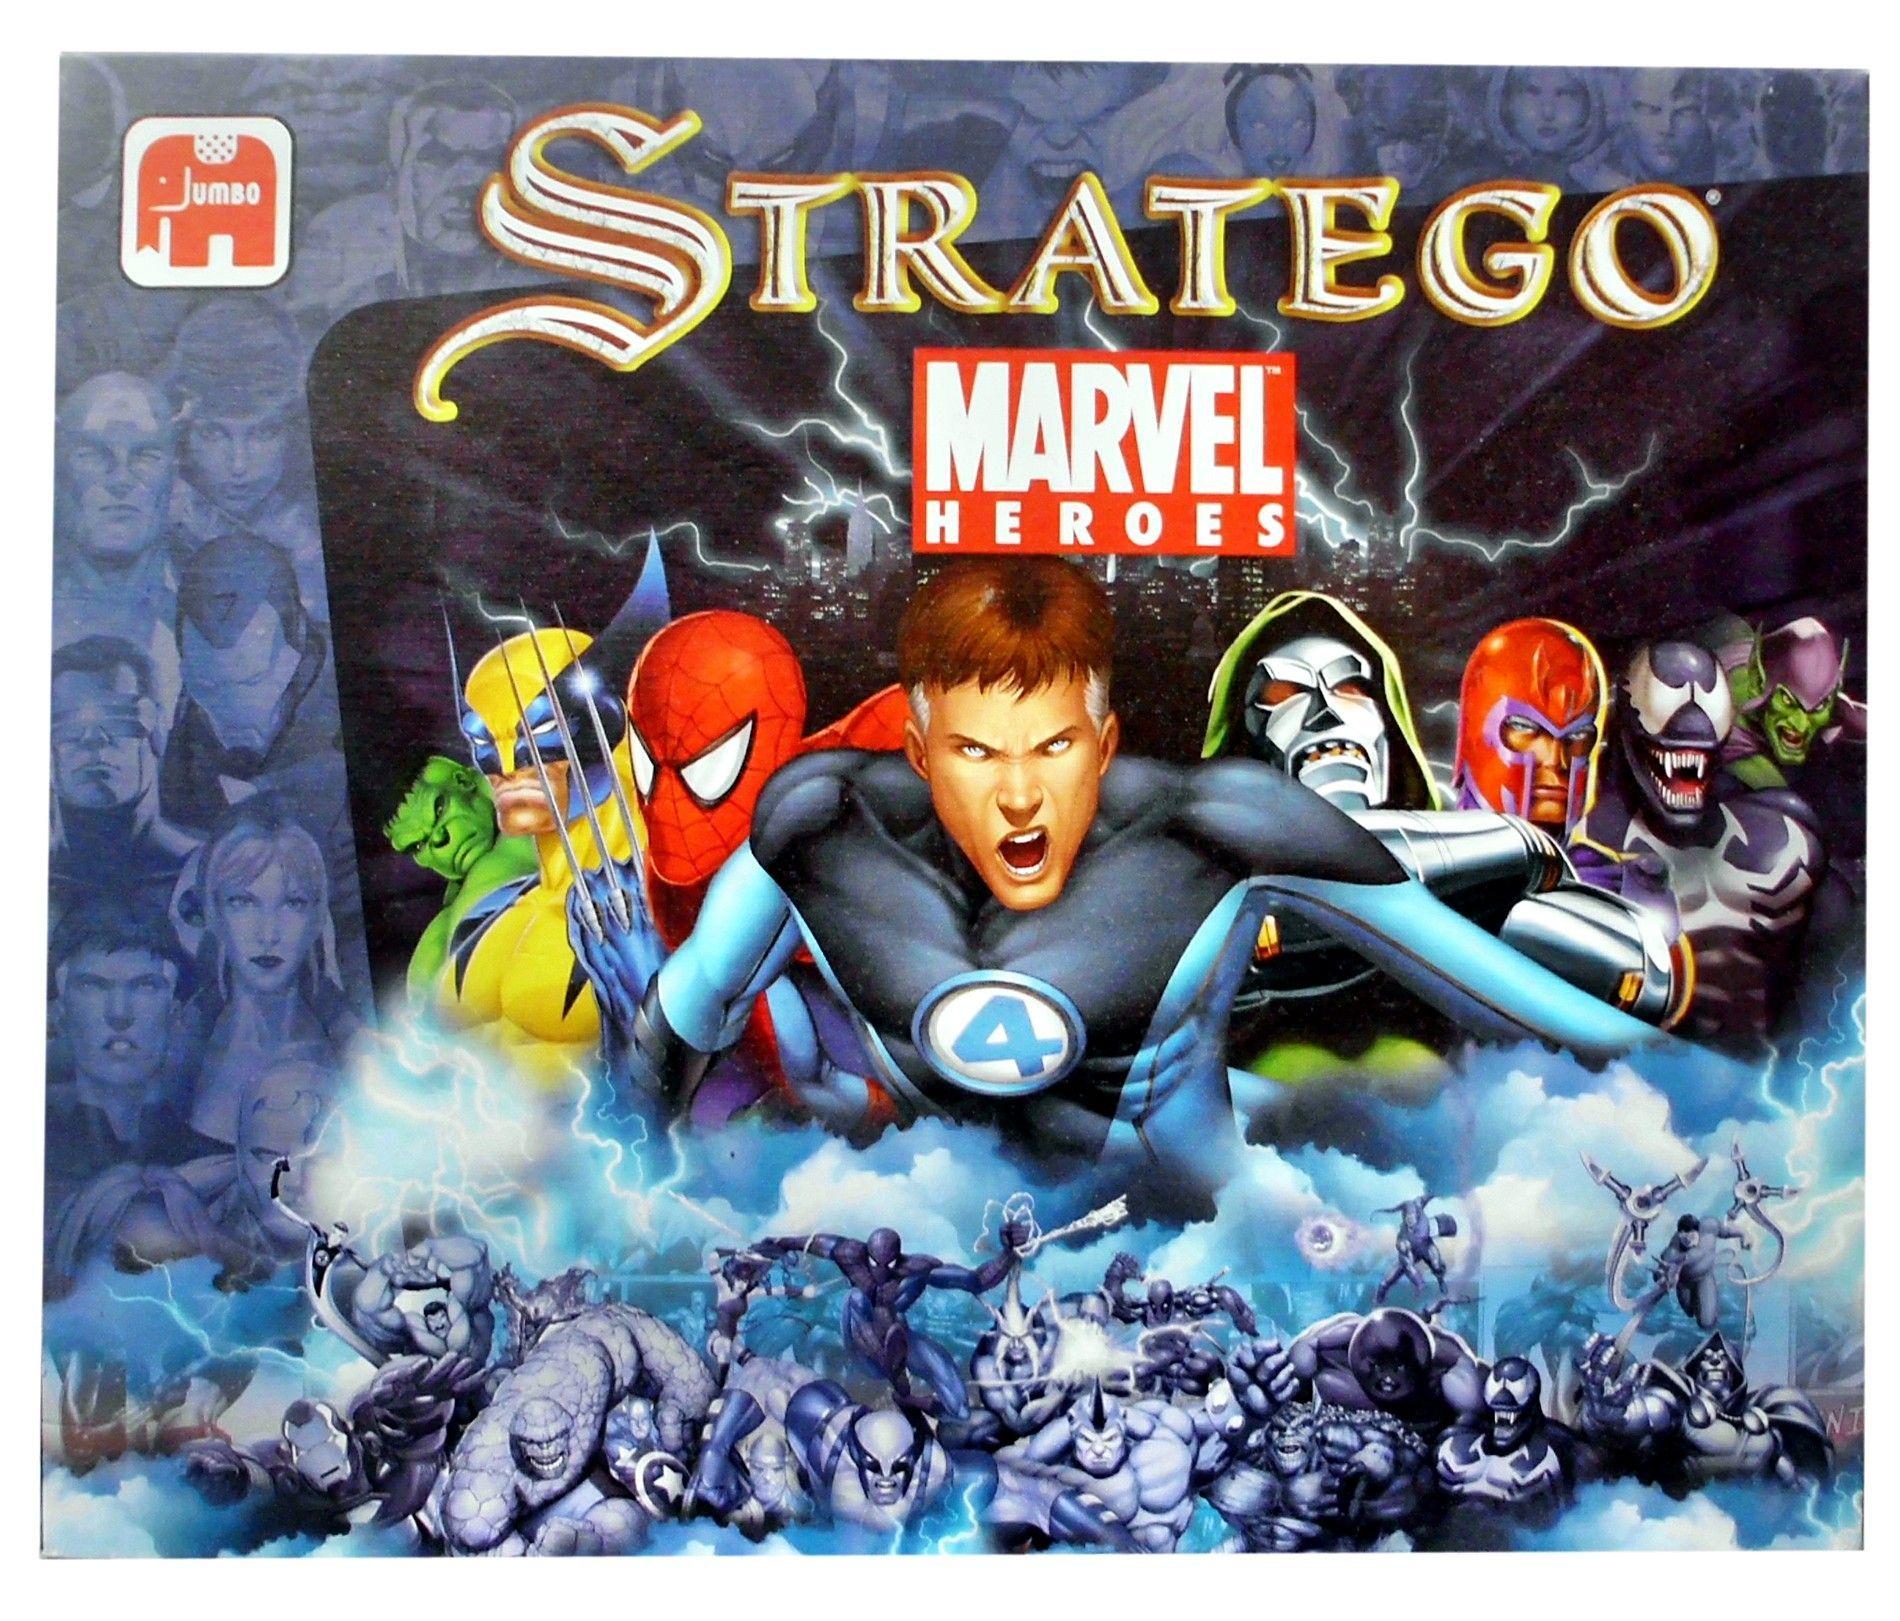 Stratego: Marvel Heroes